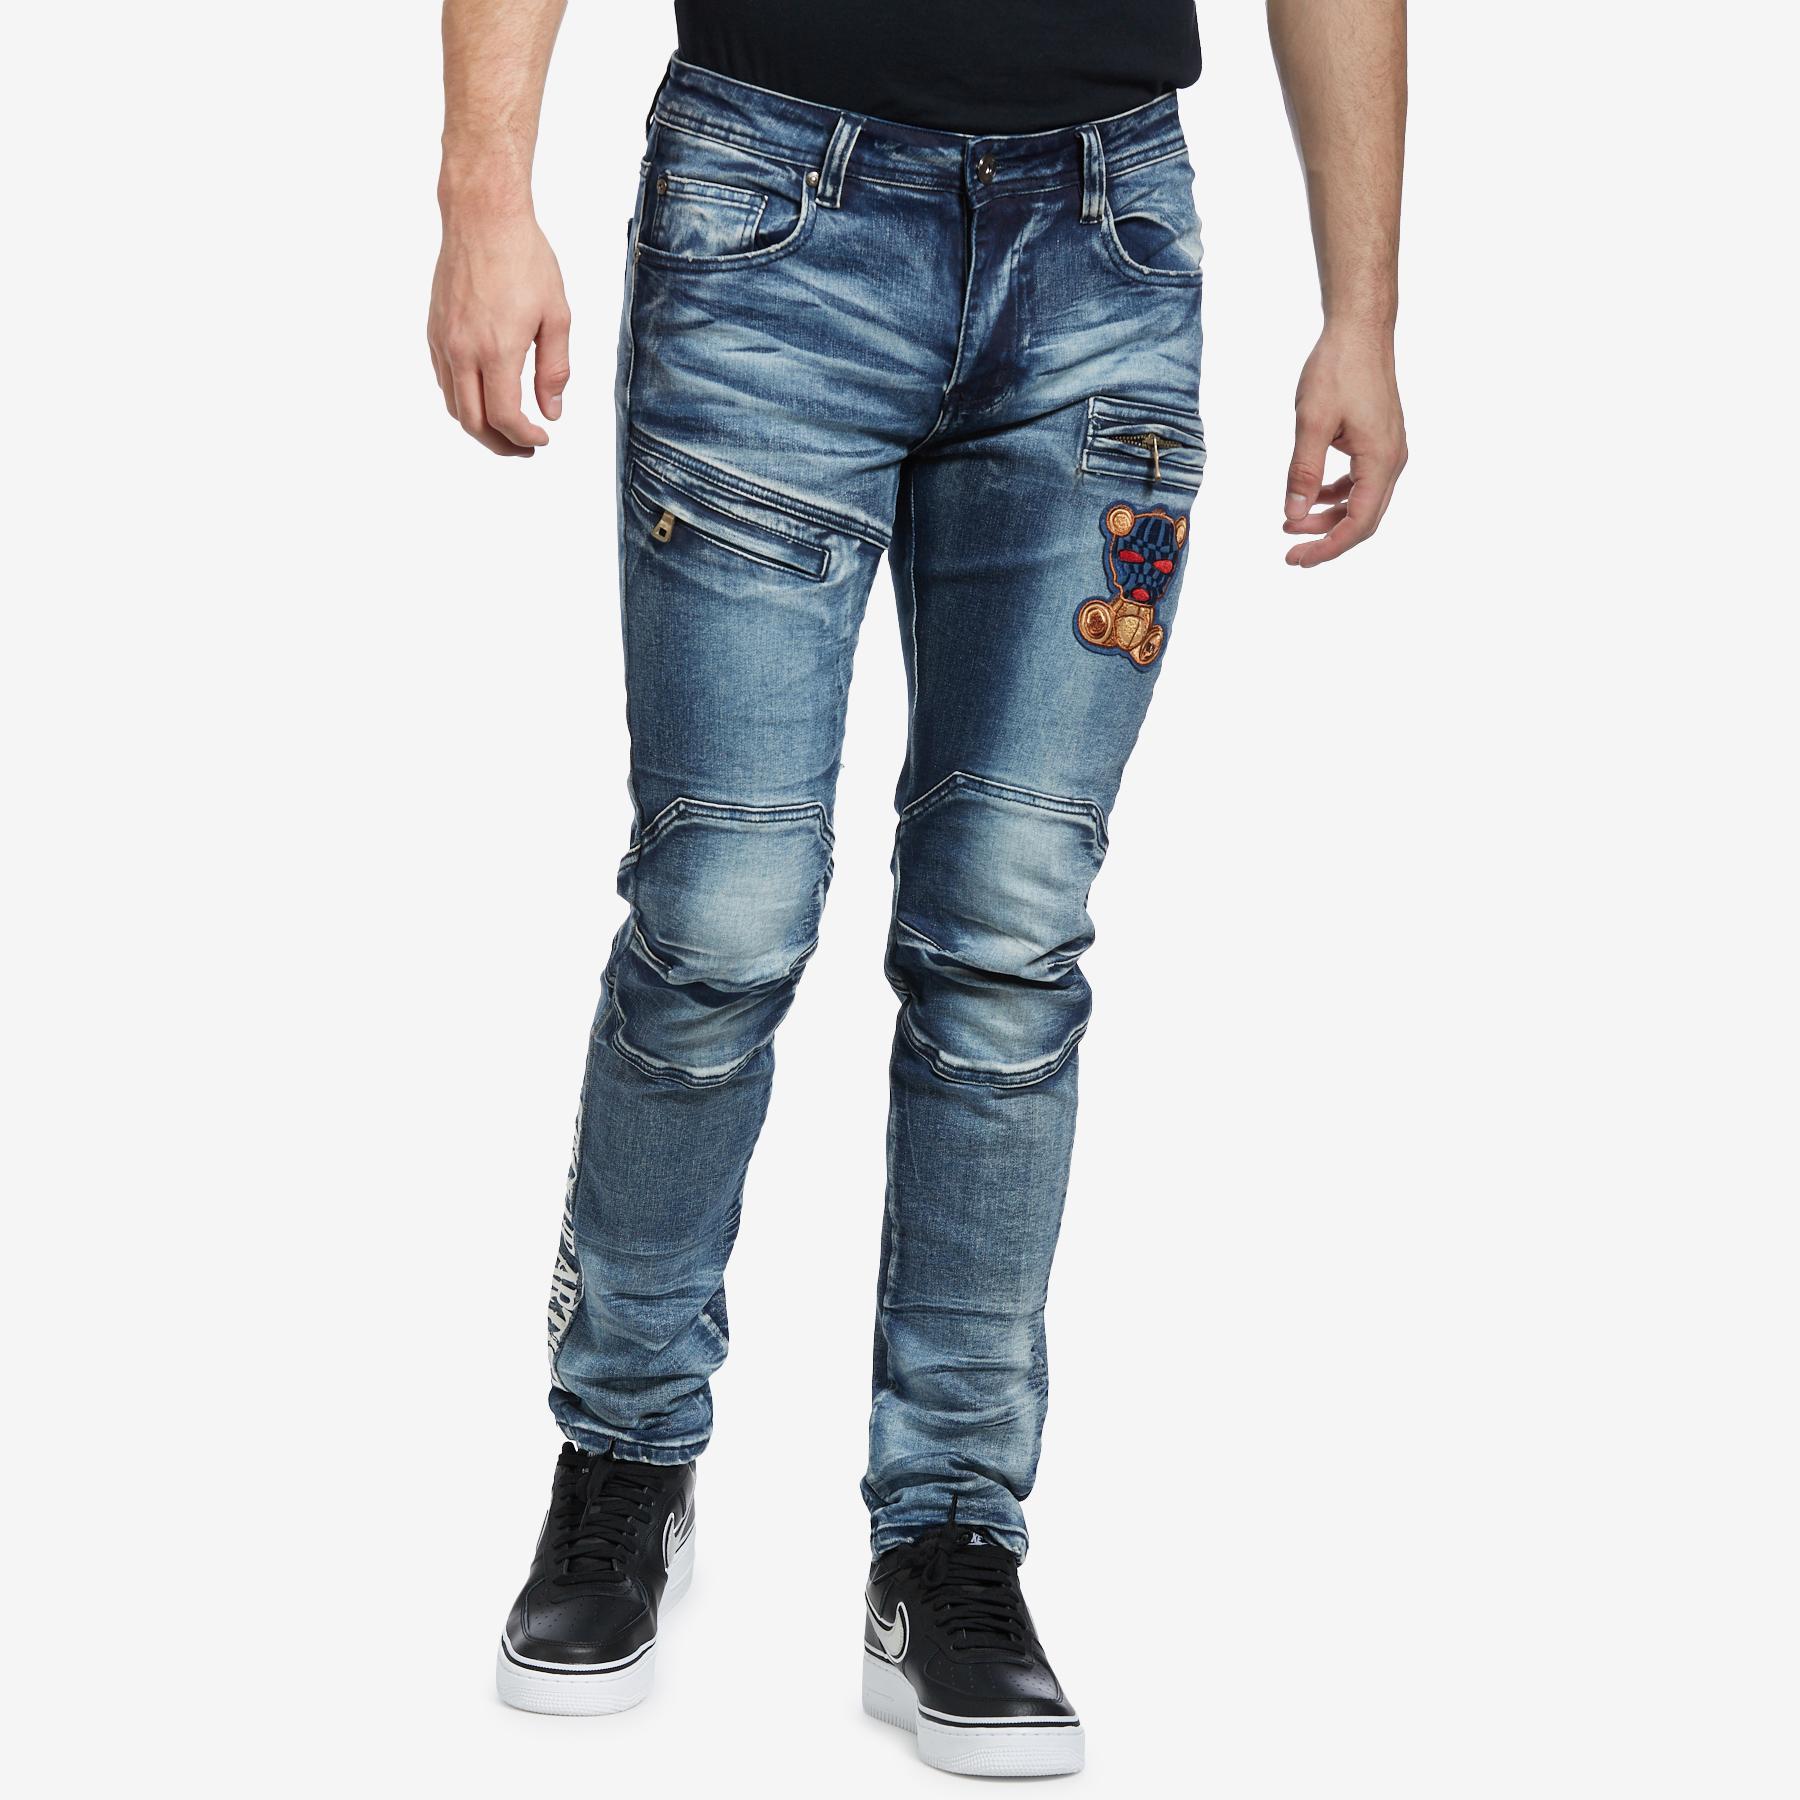 Stickup Artist Jeans